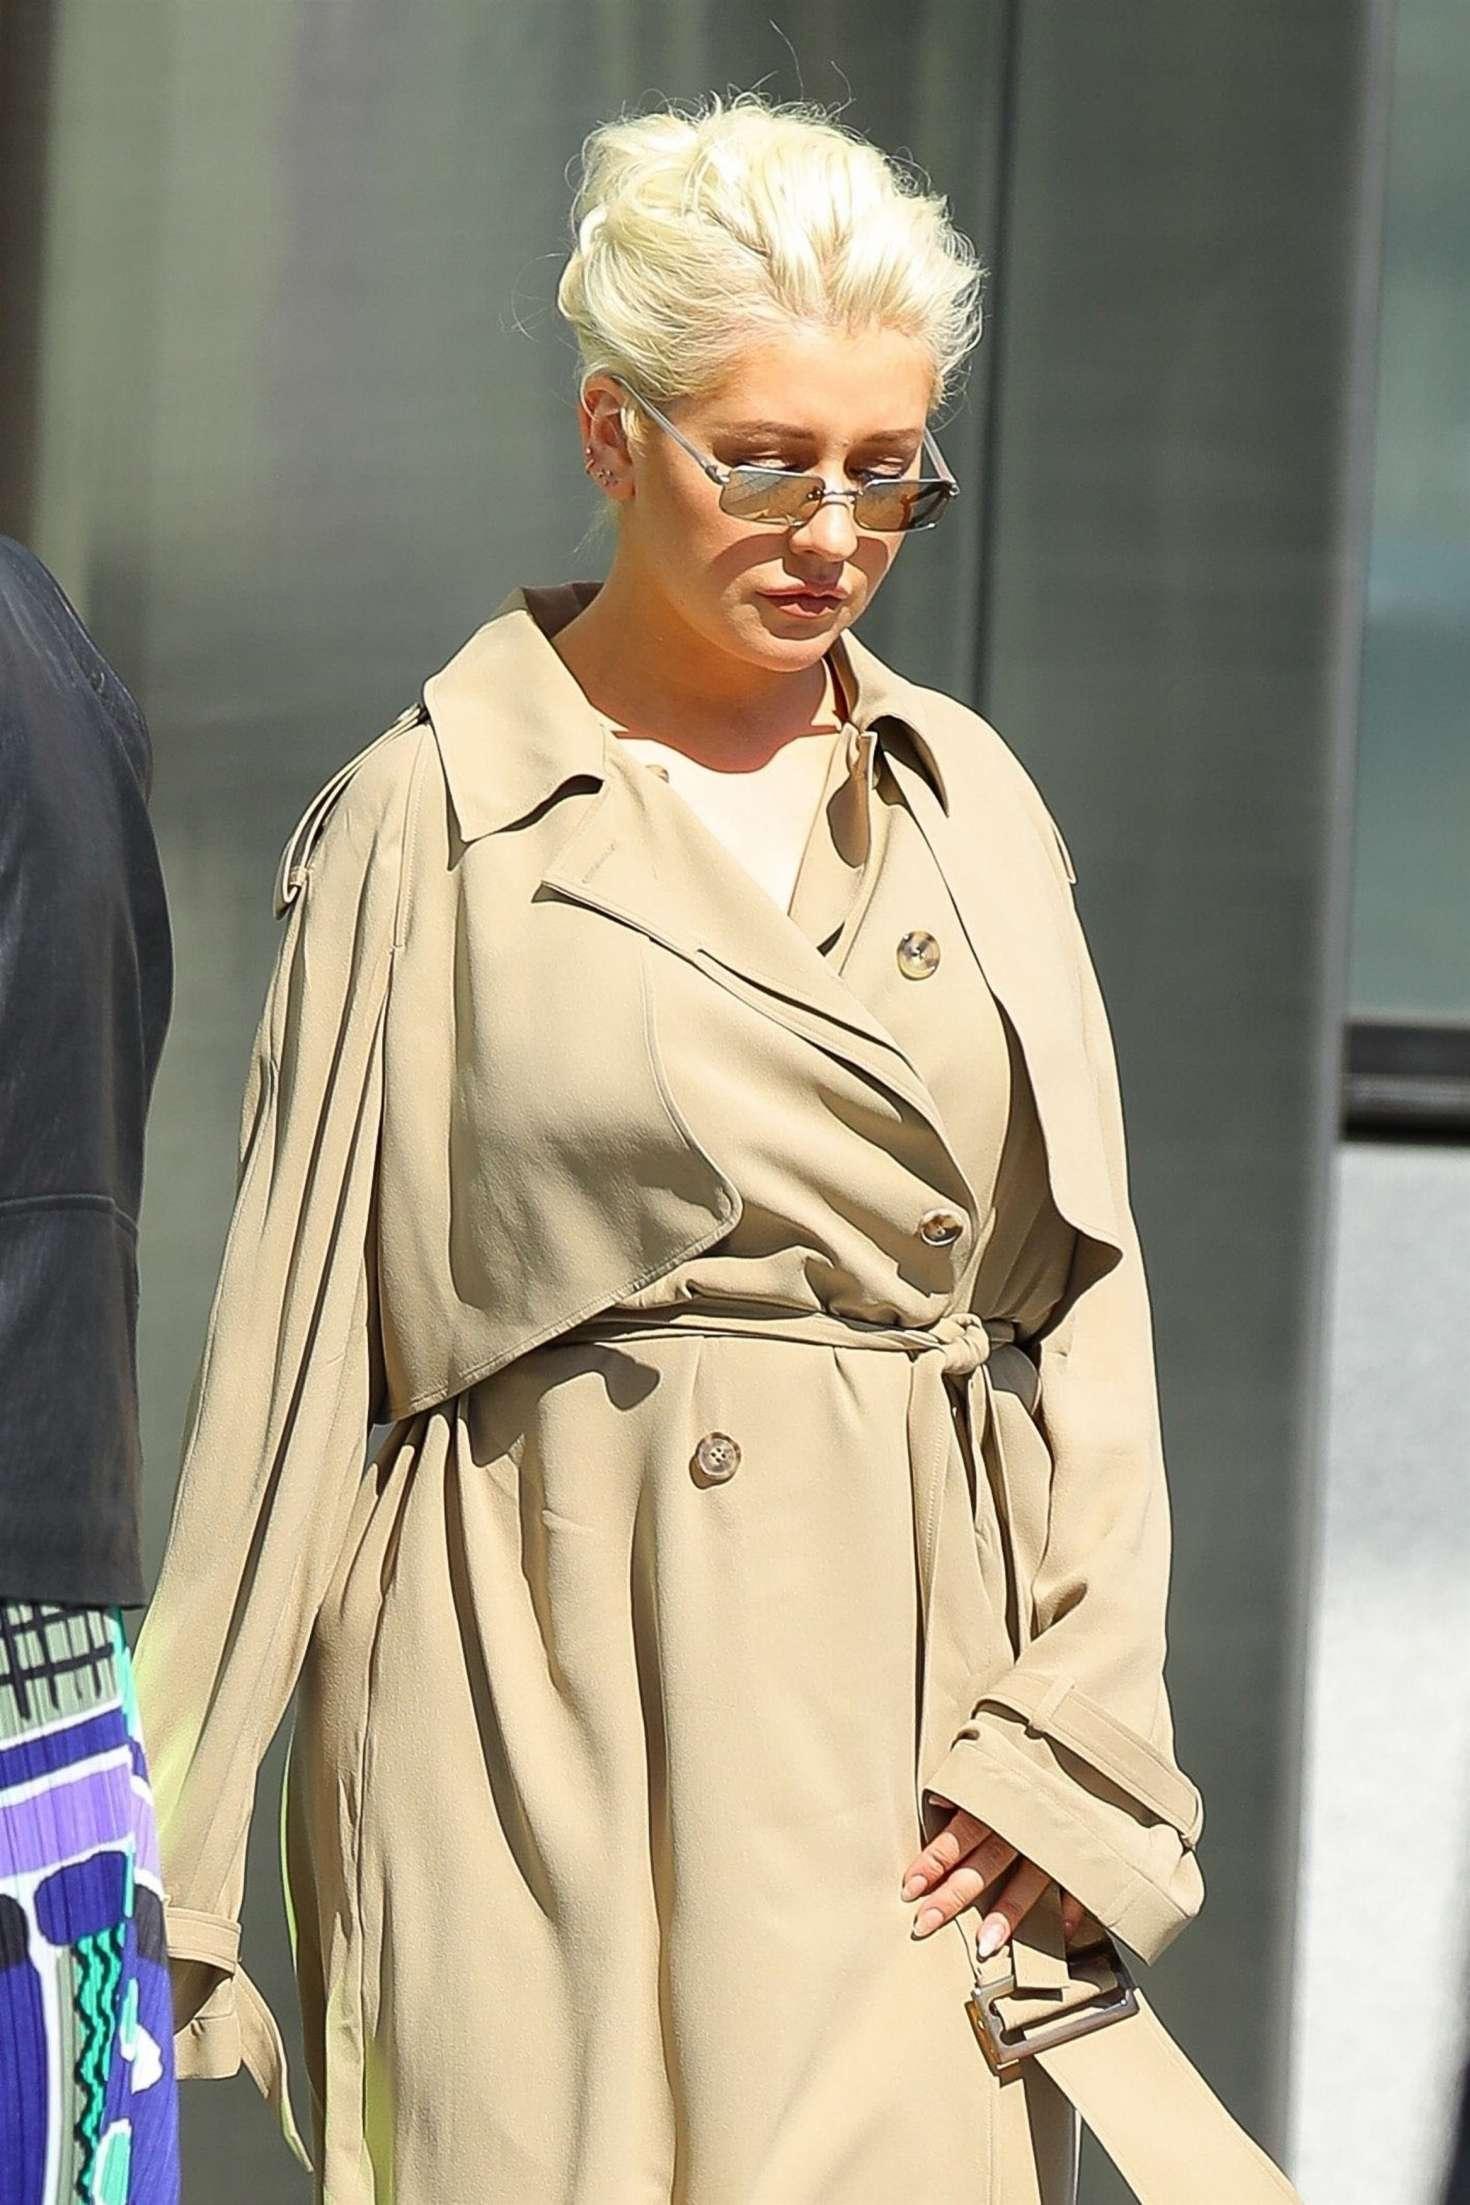 Christina Aguilera in Beige Trench Coat in New York City